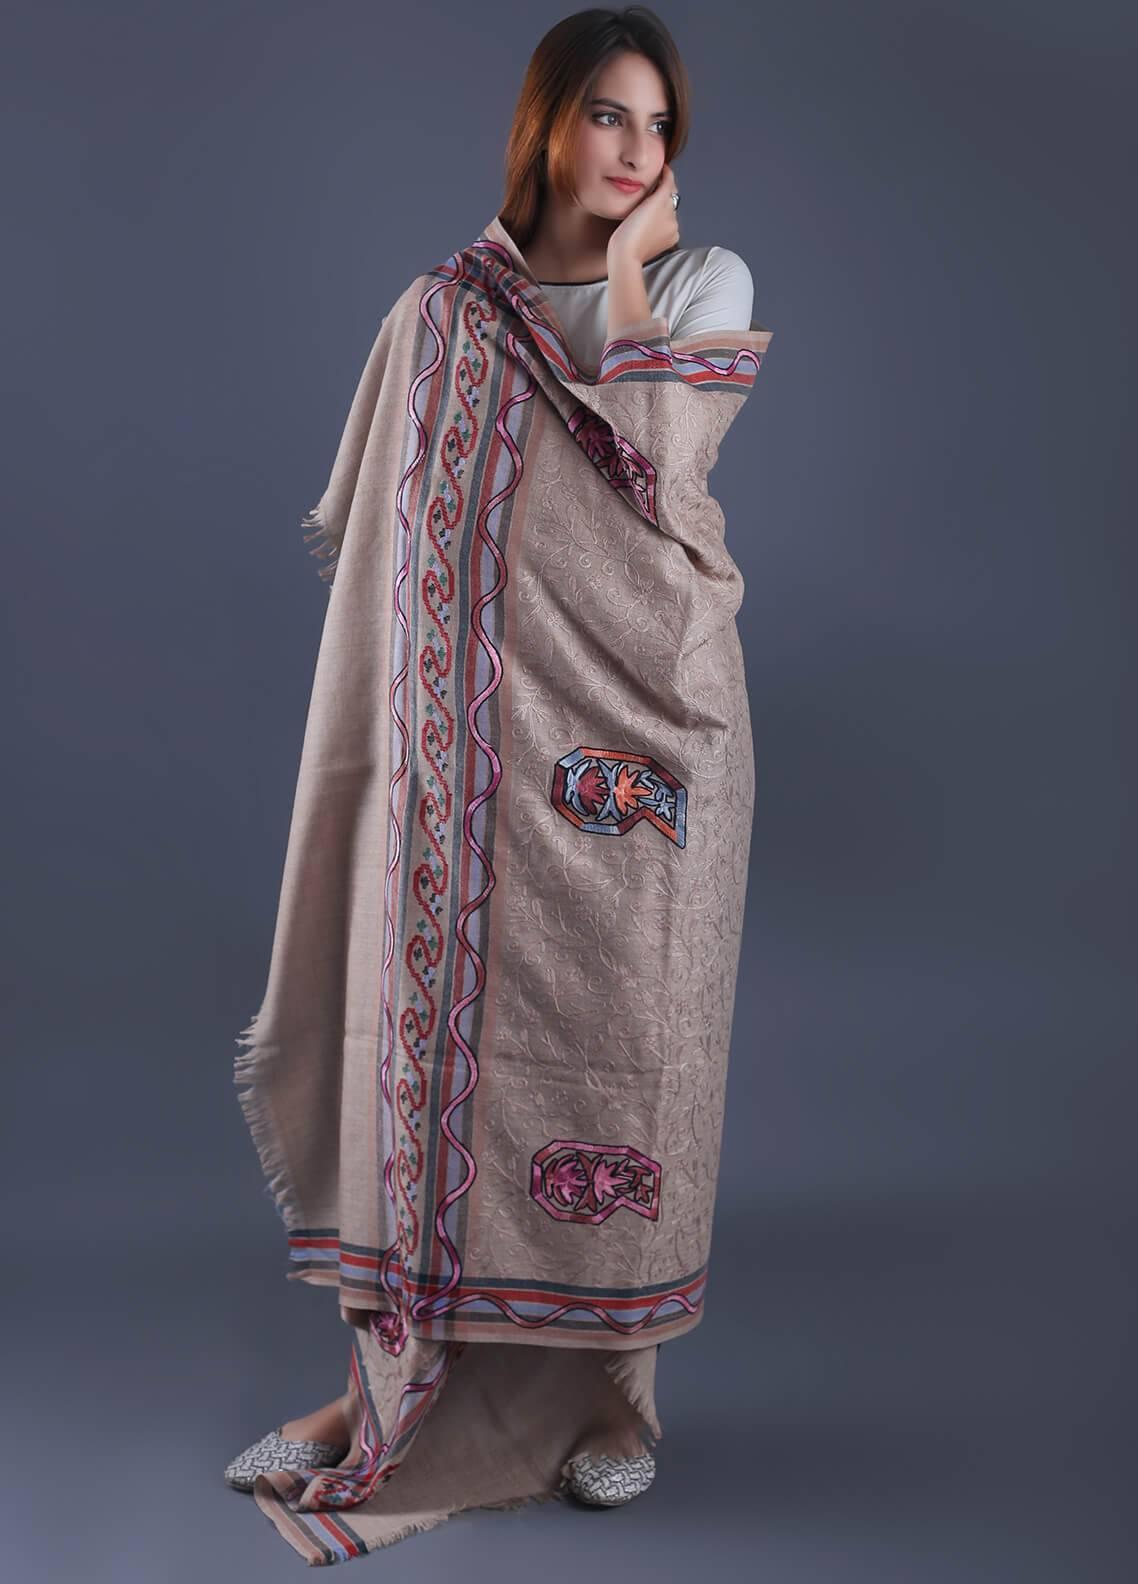 Sanaulla Exclusive Range Textured Pashmina  Shawl 29 - Formal Collection